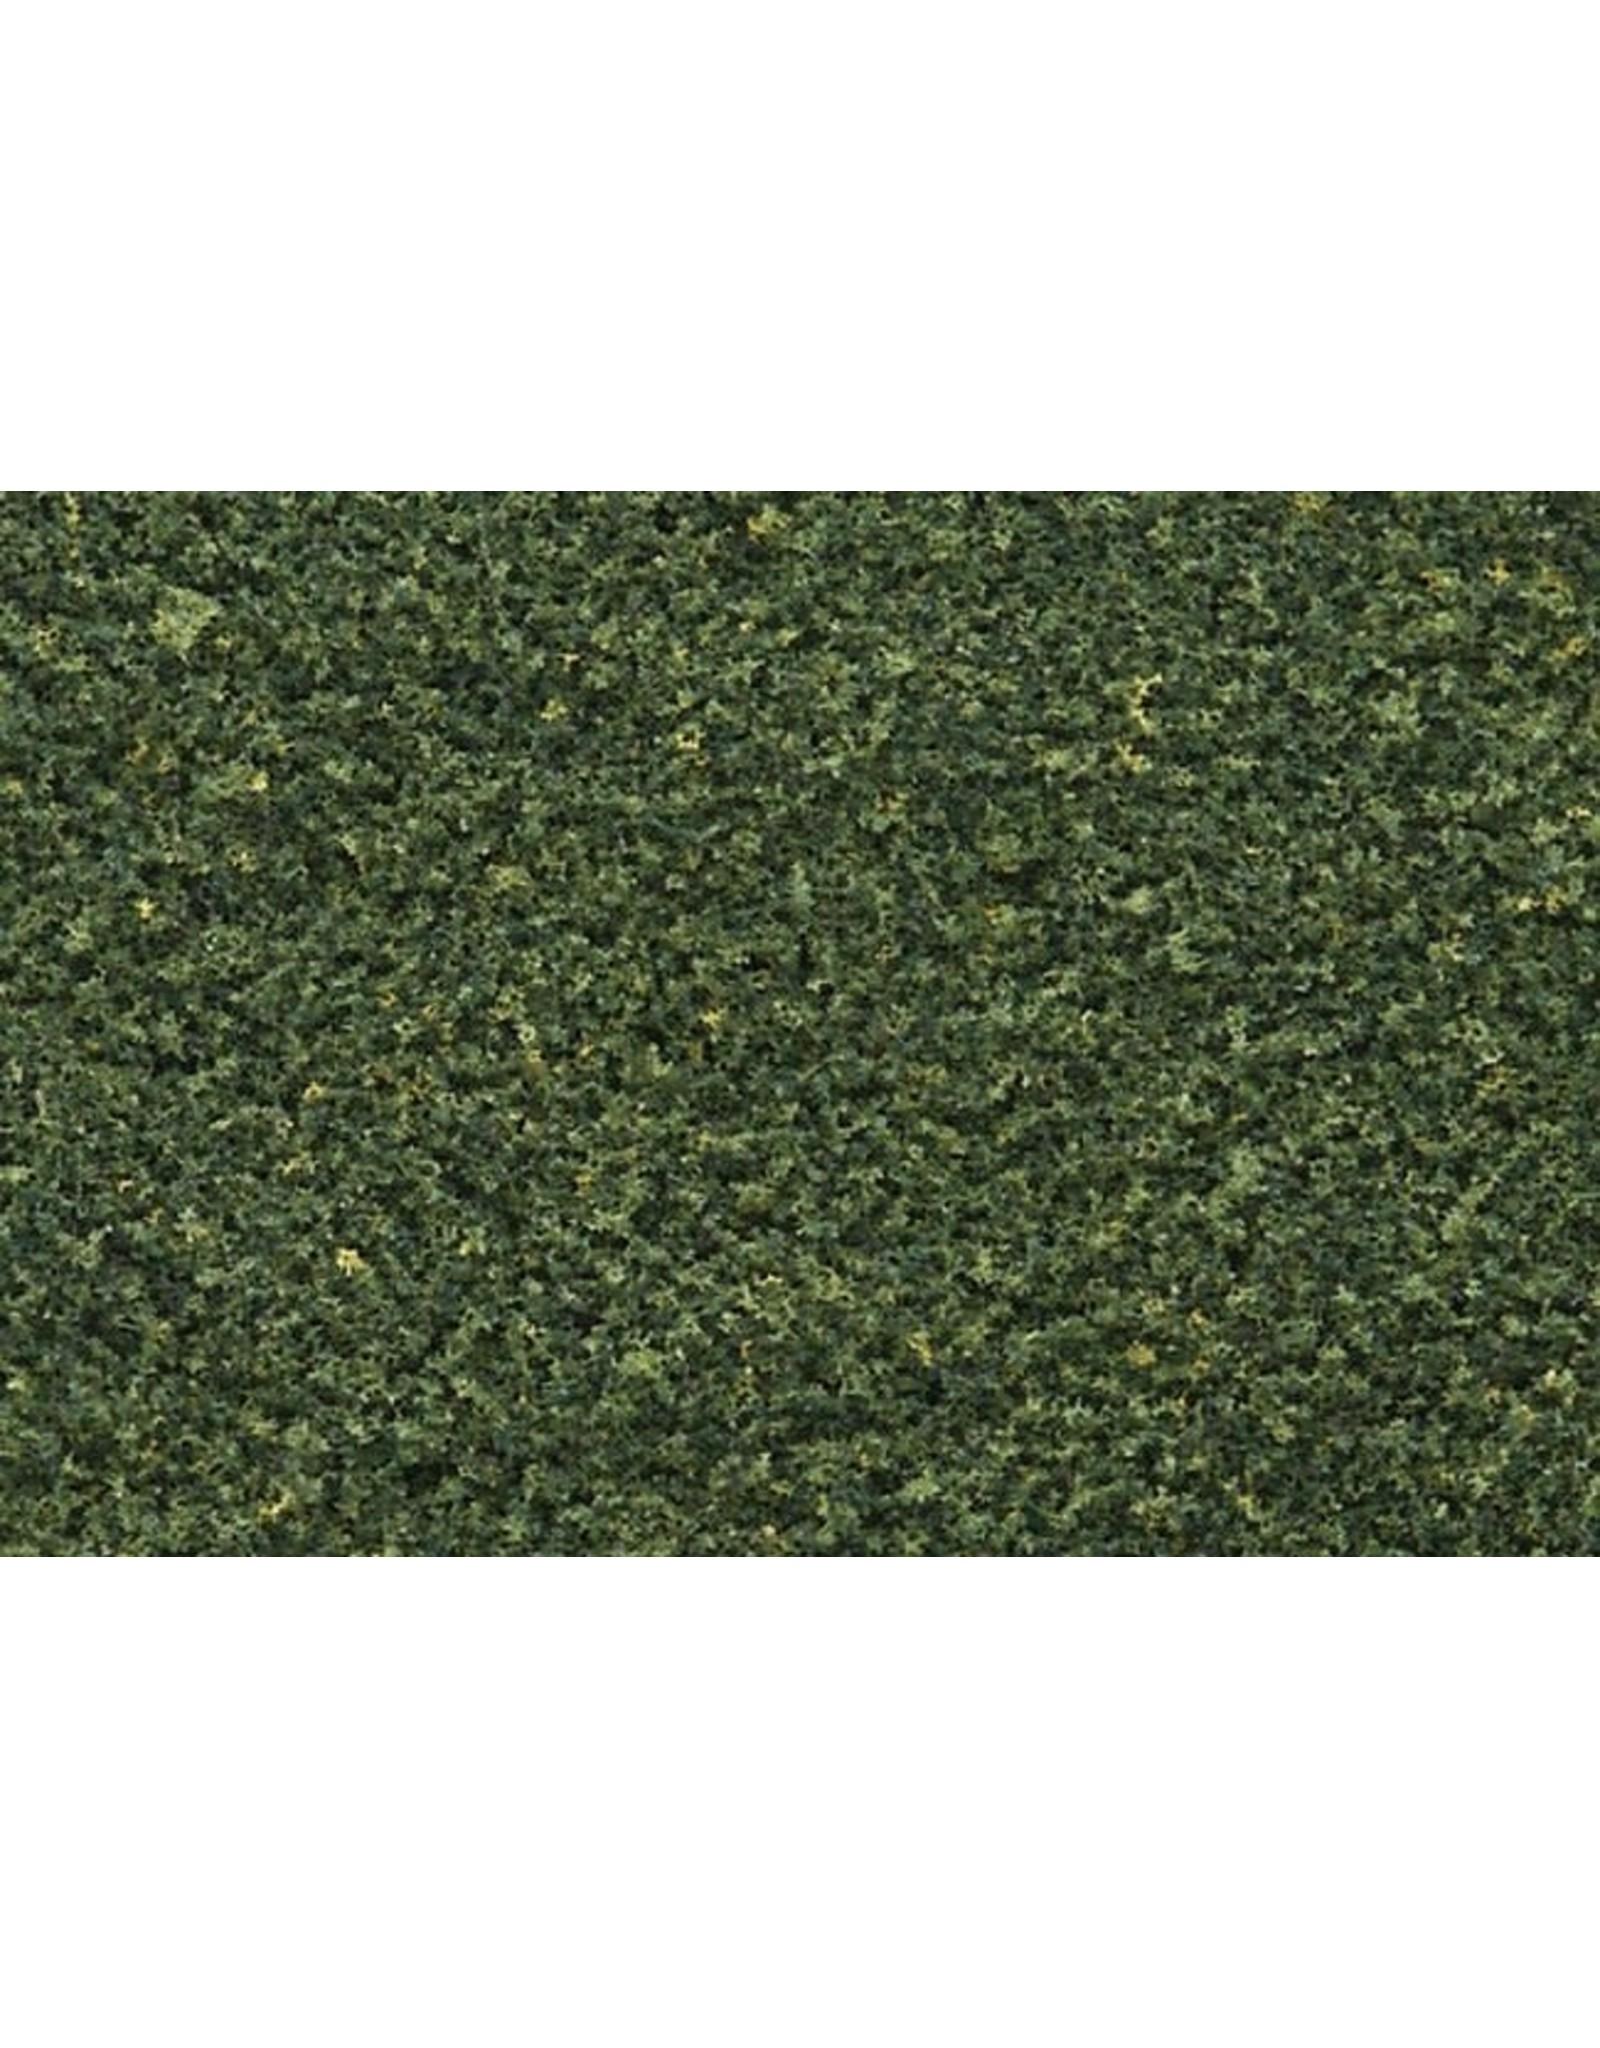 Woodland Scenics Blended Turf Green Blend T1349